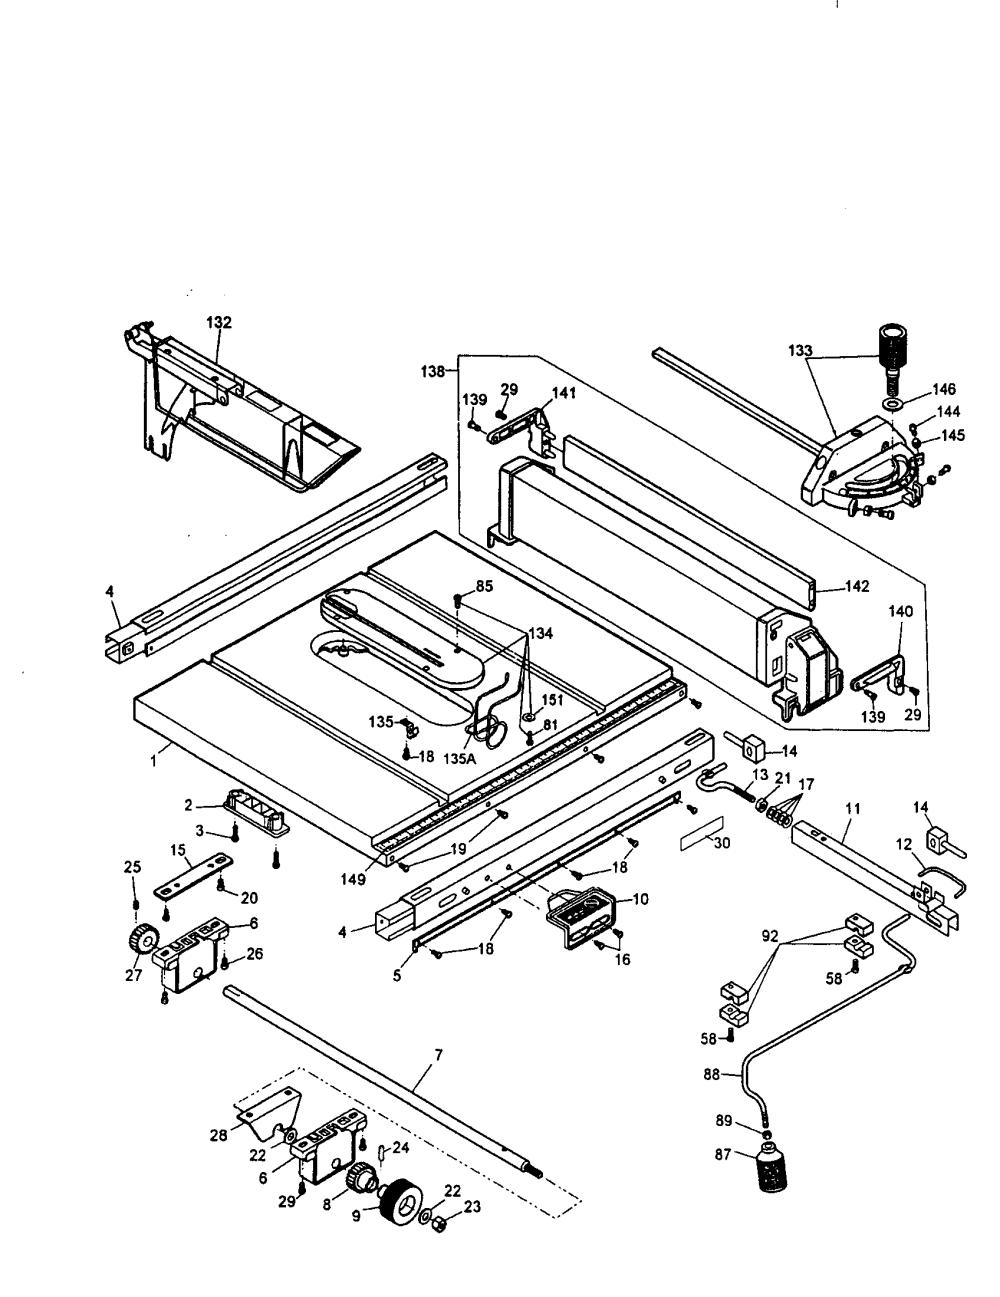 medium resolution of looking for dewalt model dw744 type 1 table saw repair u0026 replacementdw744 table saw wiring